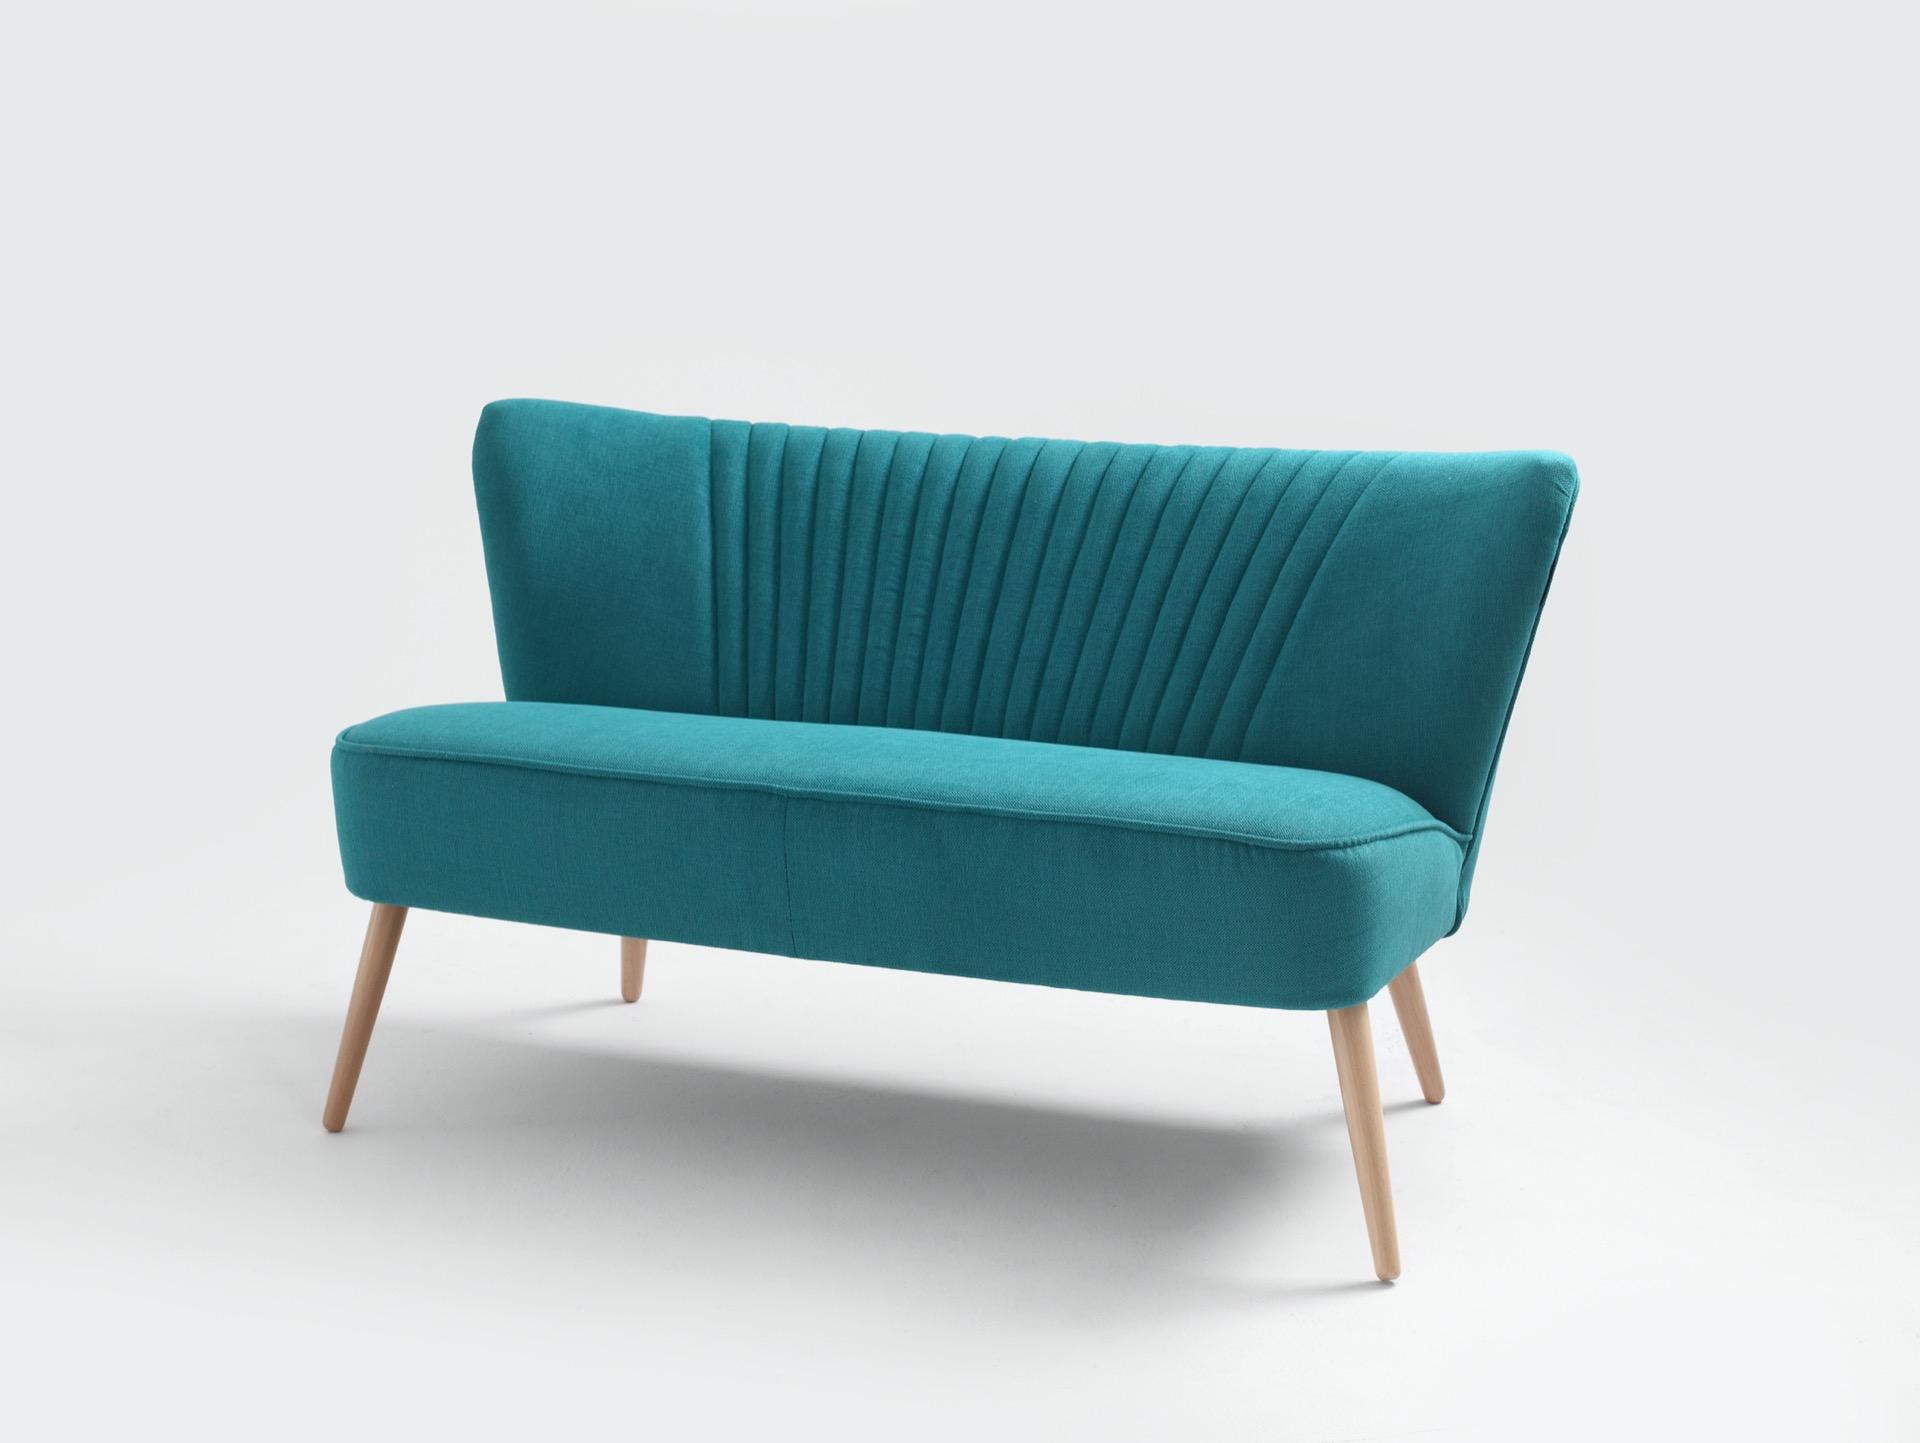 2-Sitzer Sofa HARRY